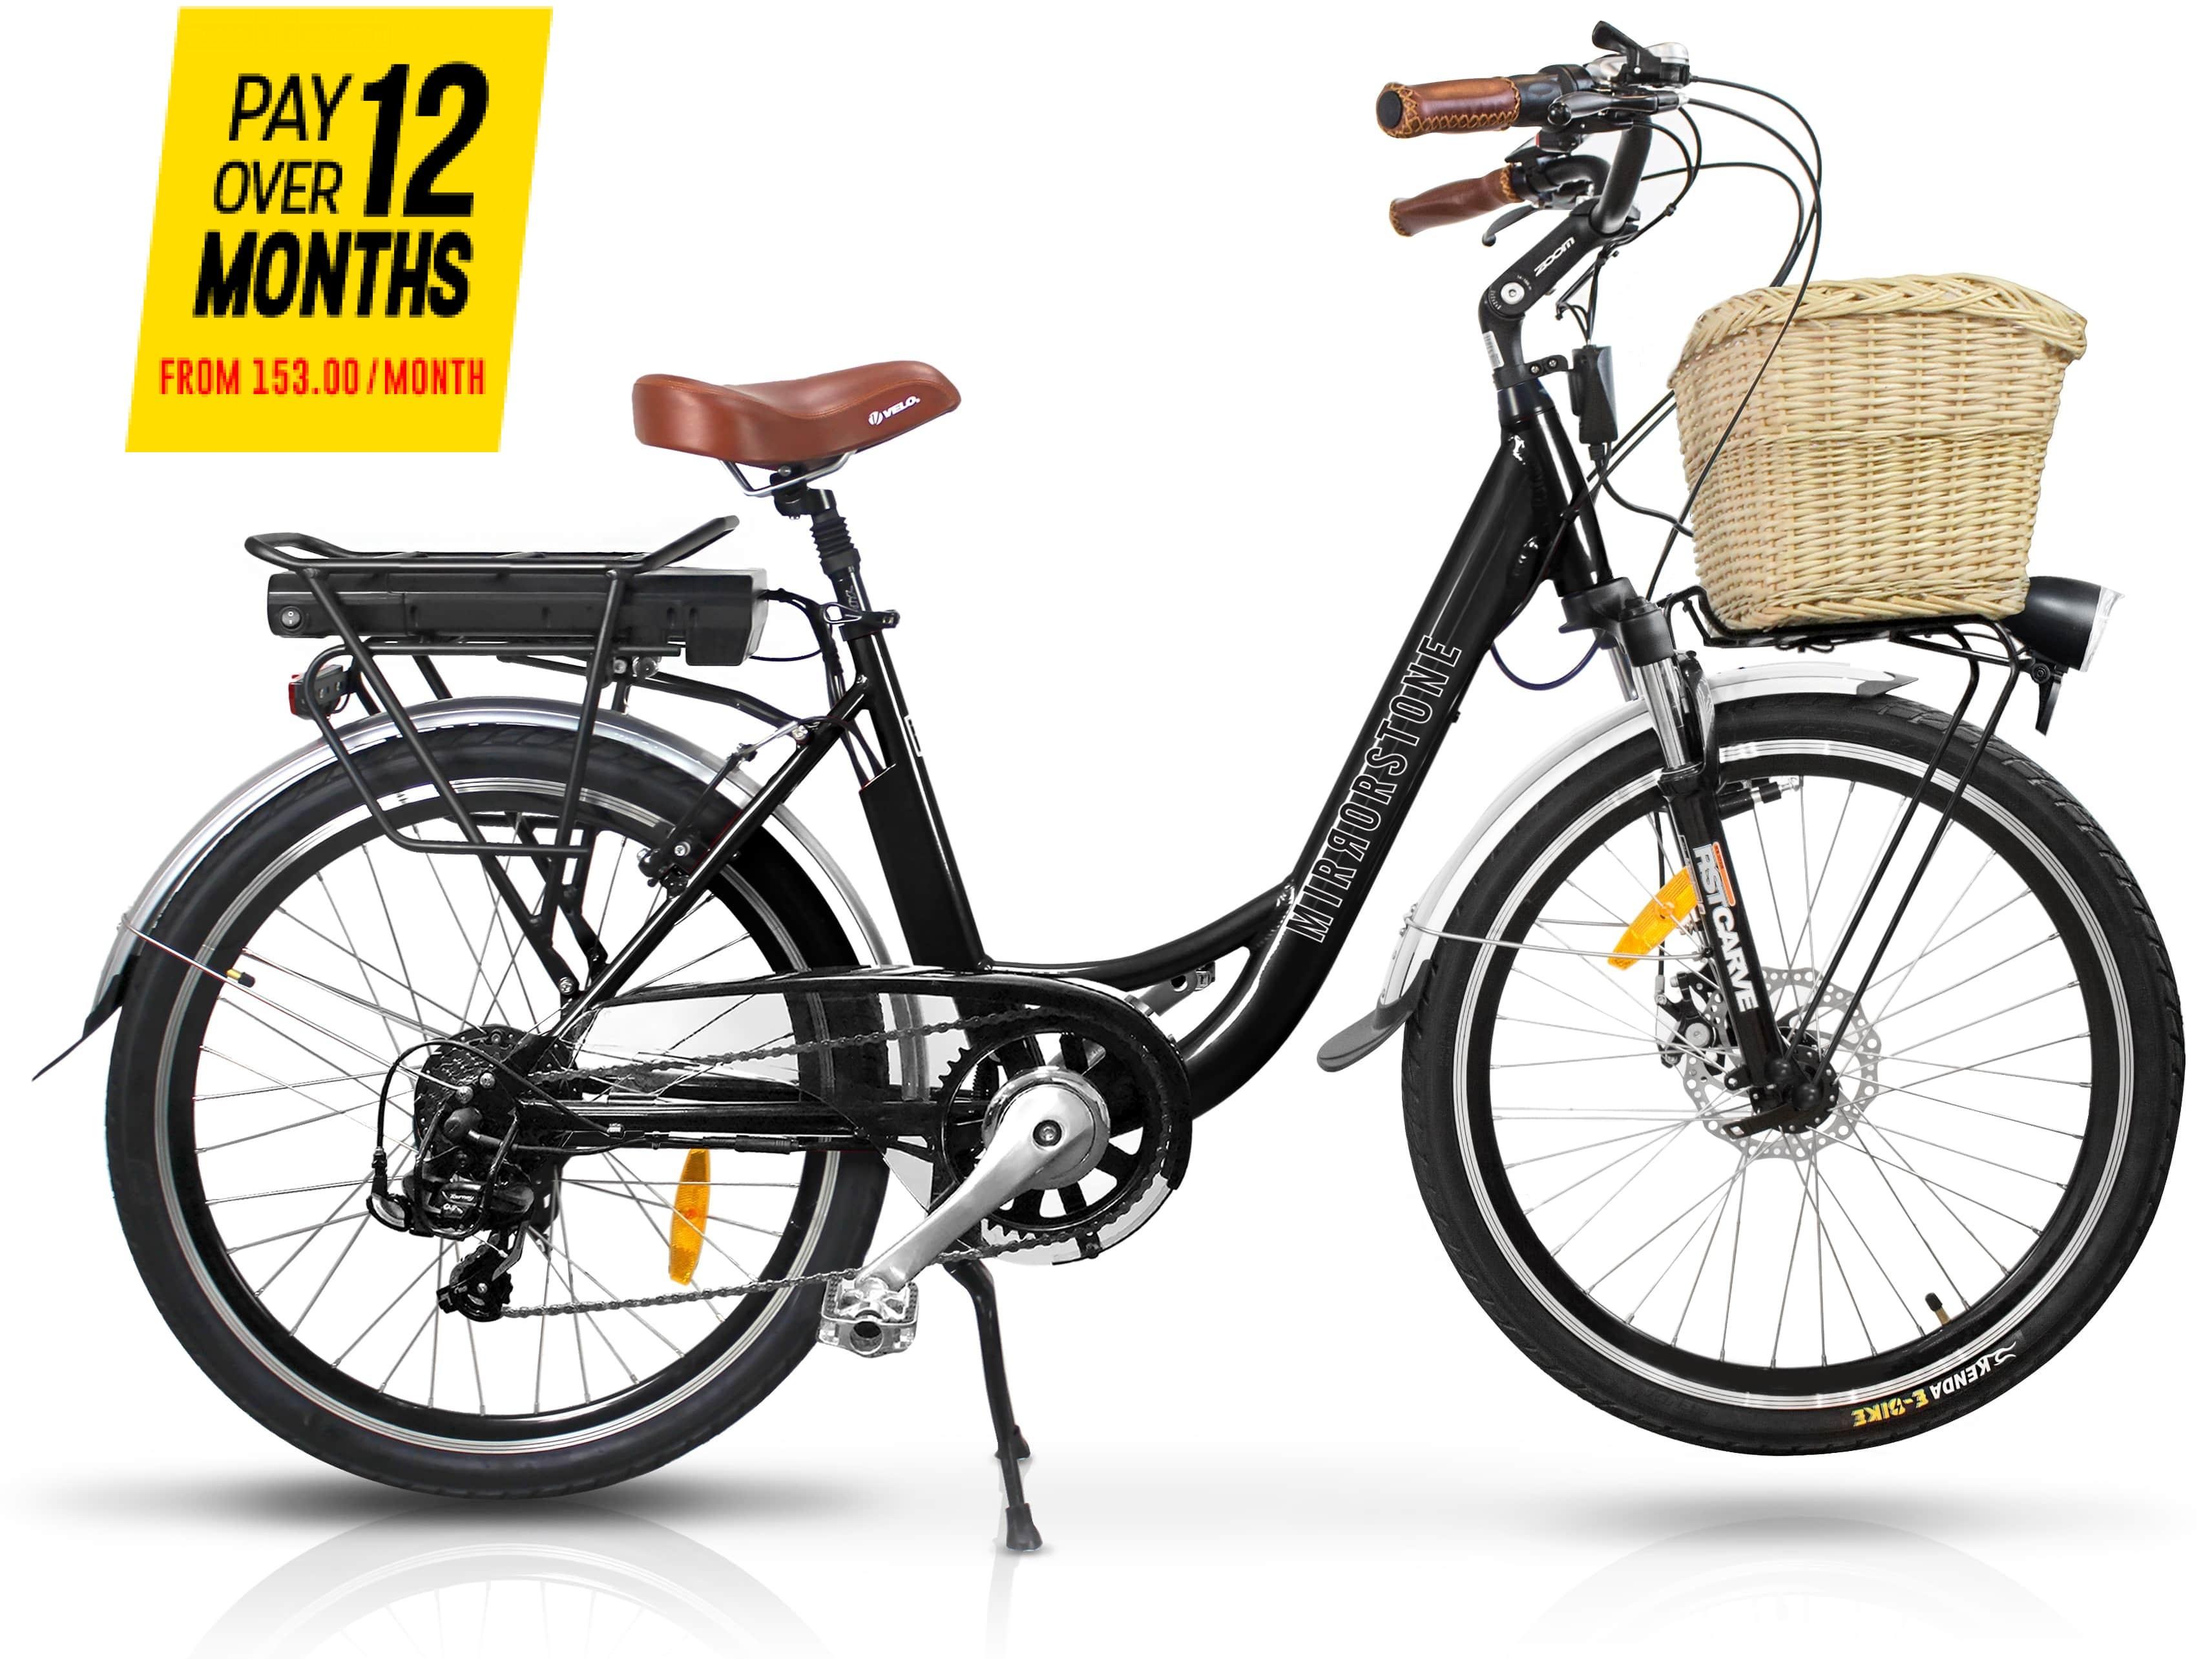 Sprint Electric Bike Black Wheels - Now In Stock!